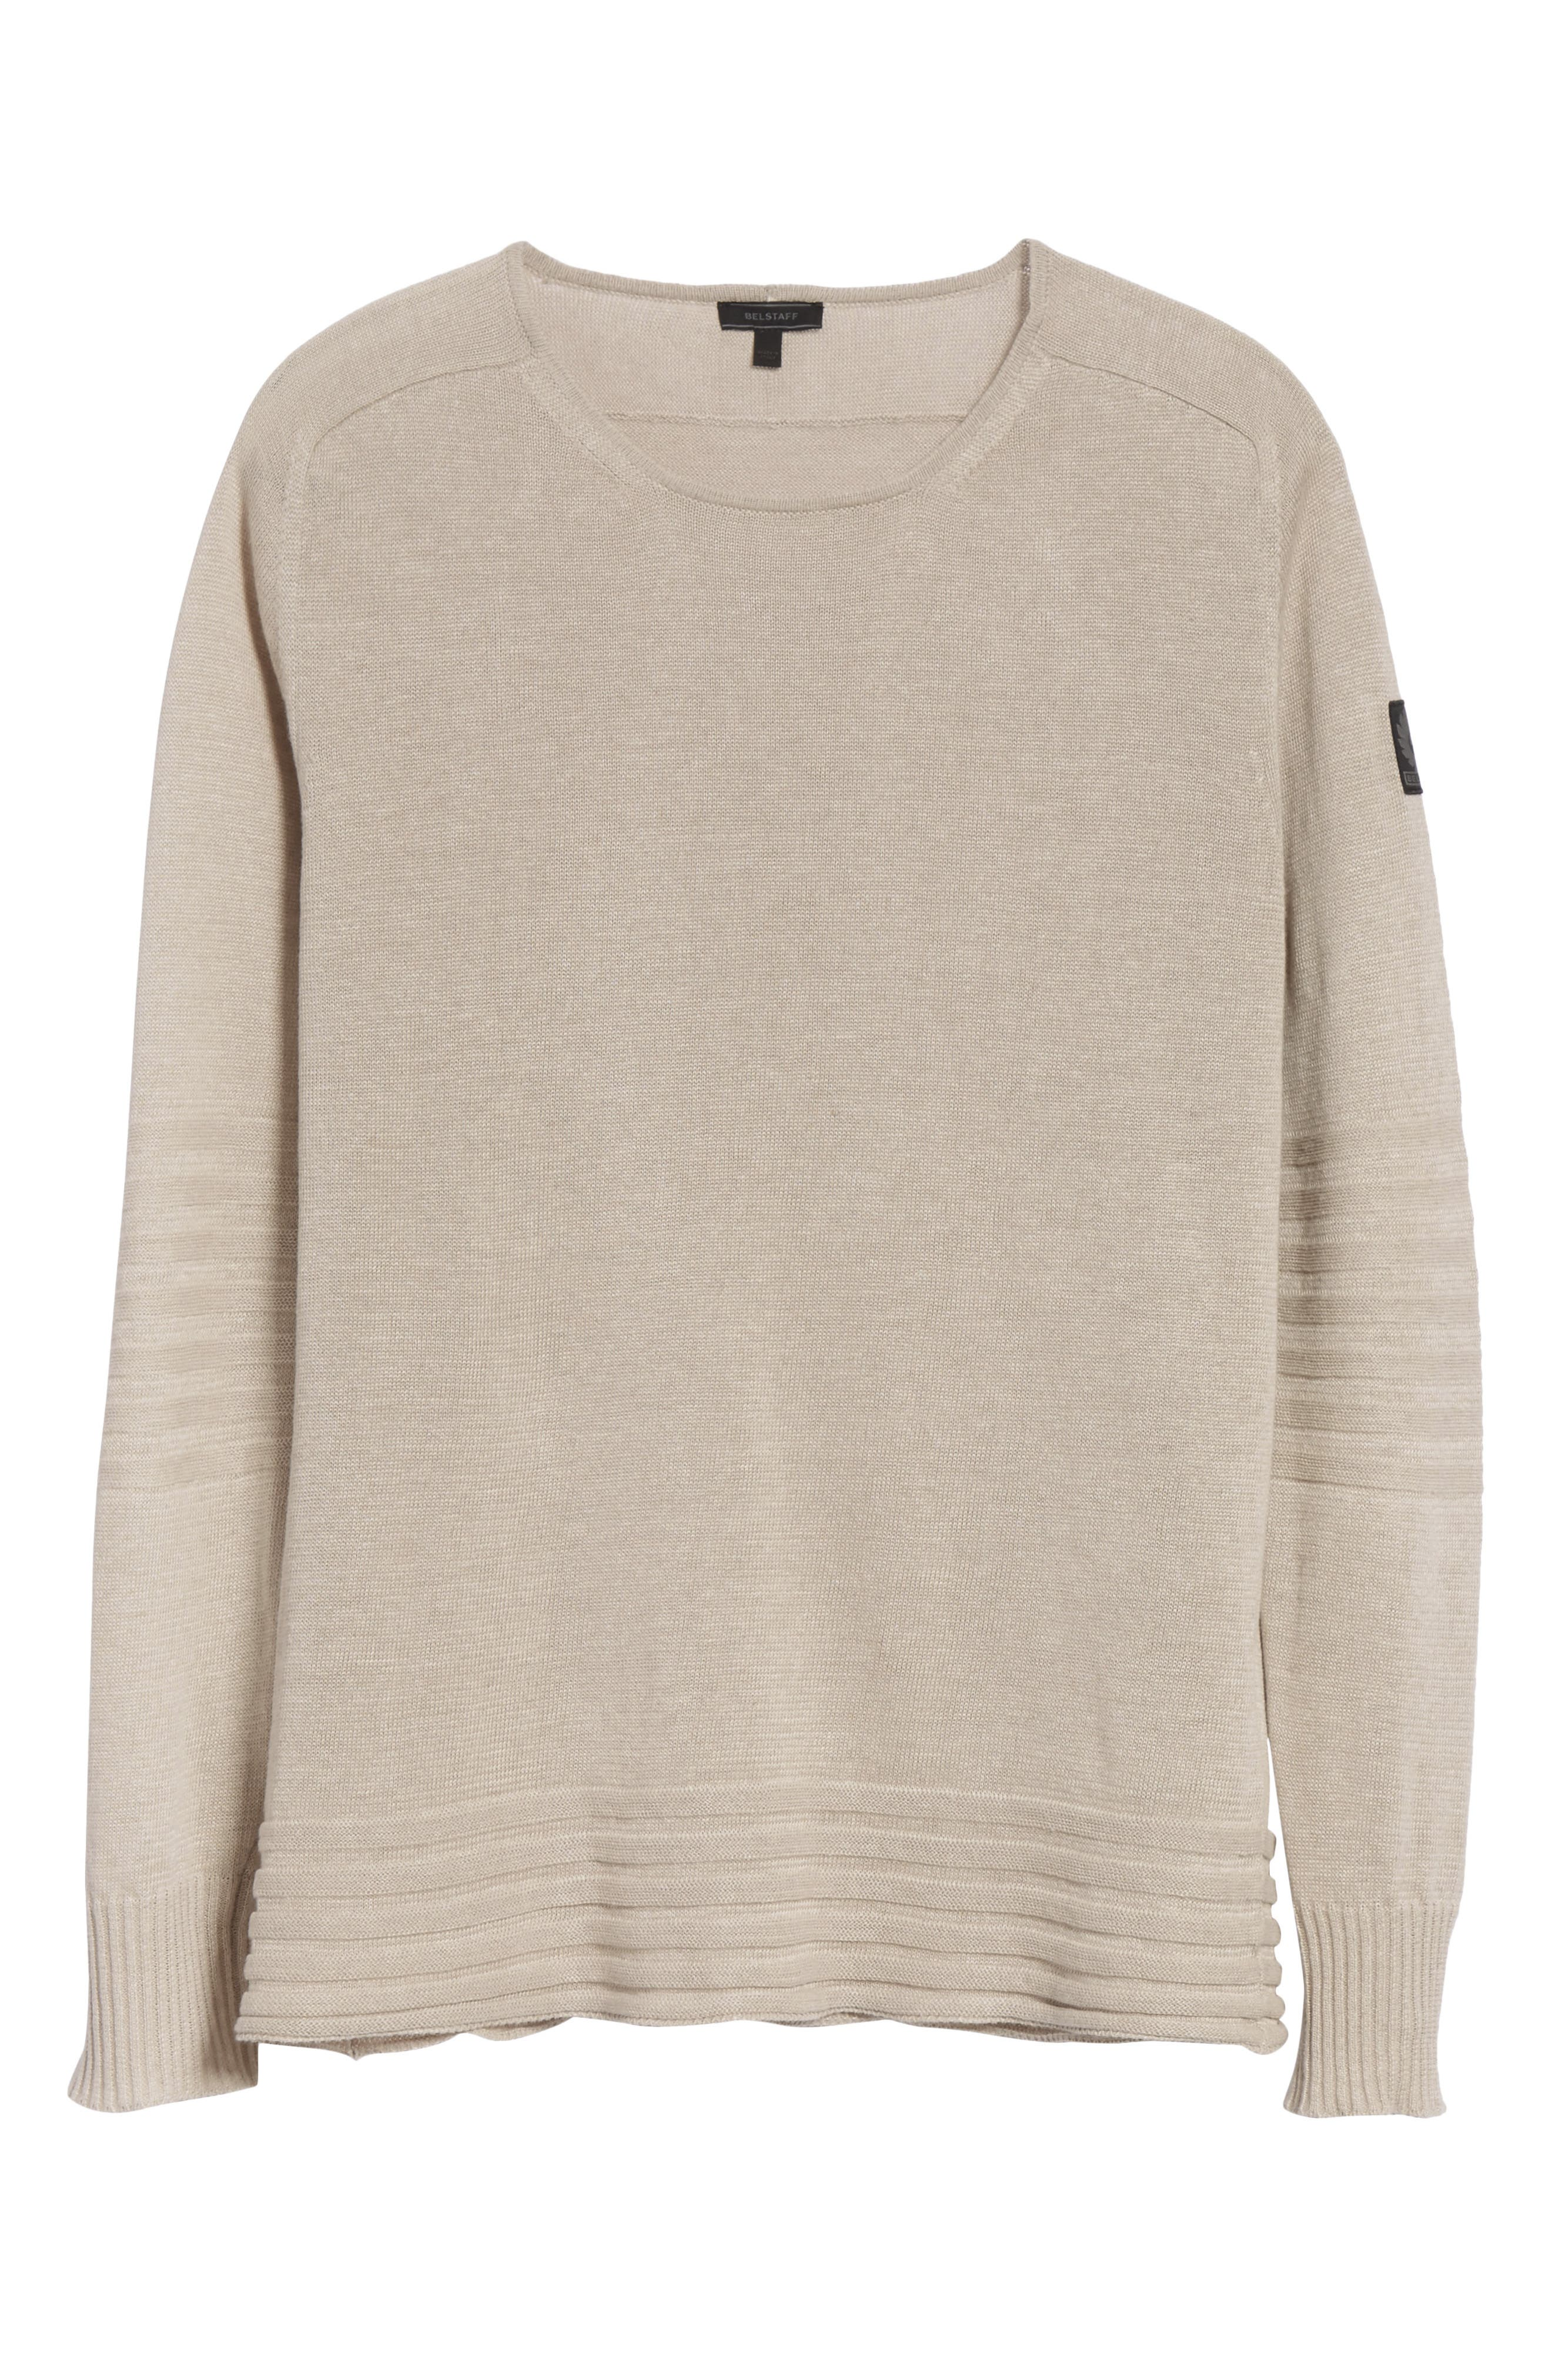 Exford Linen Crewneck Sweater,                             Alternate thumbnail 6, color,                             270